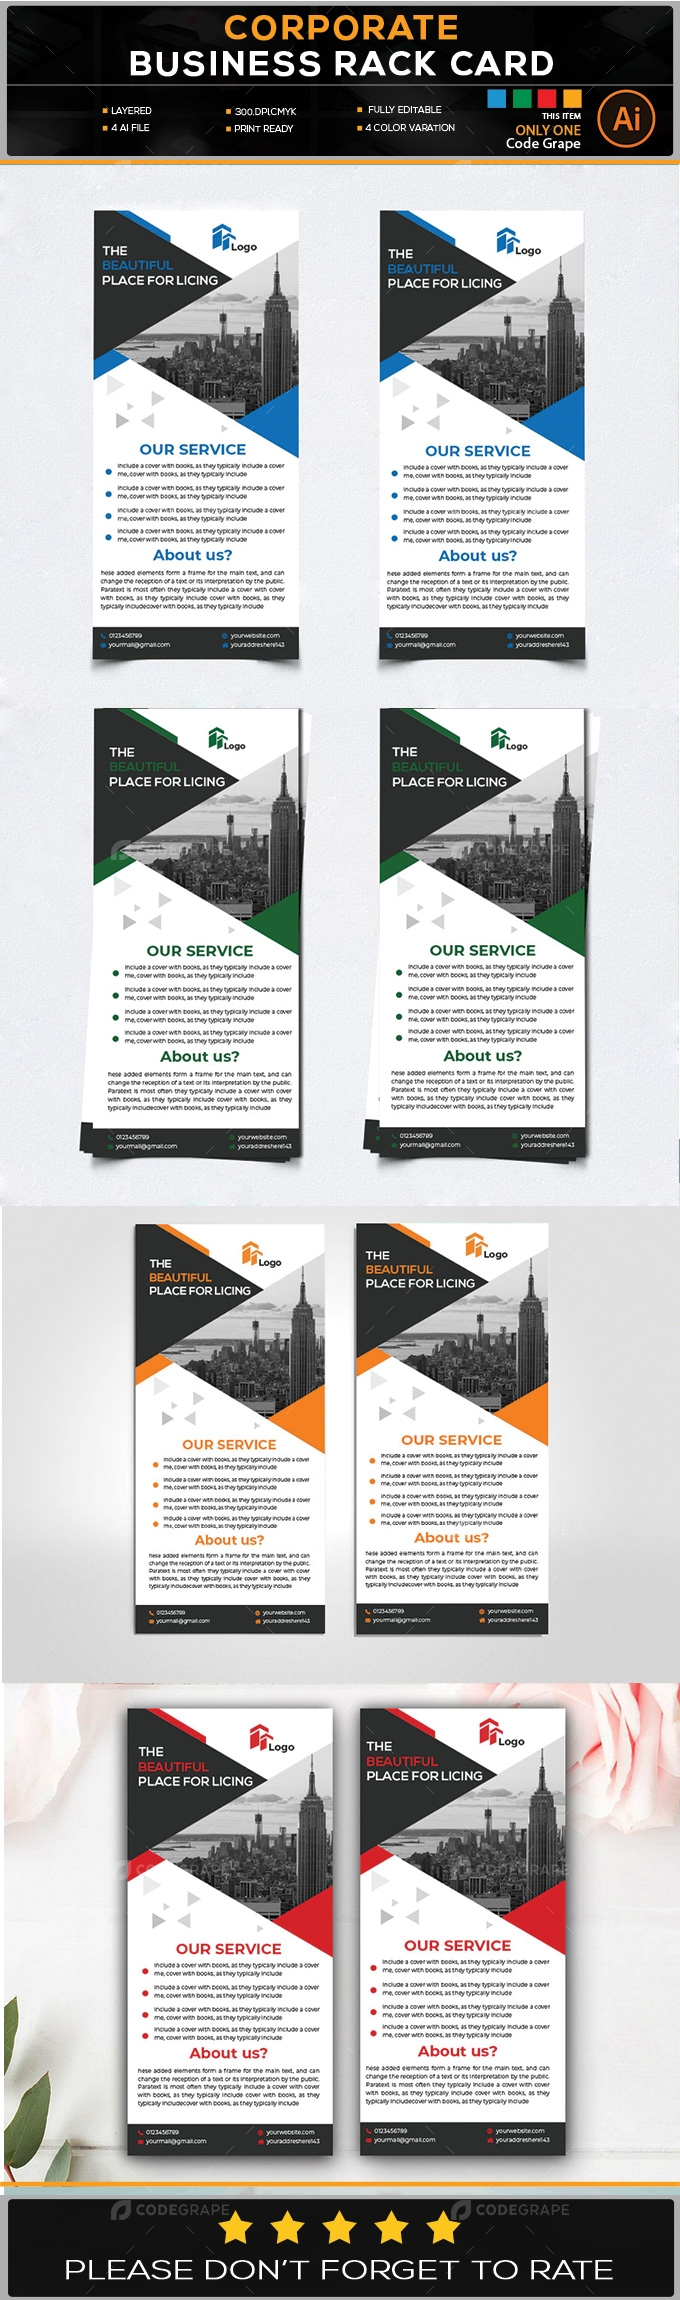 Corporate Business Rack Card